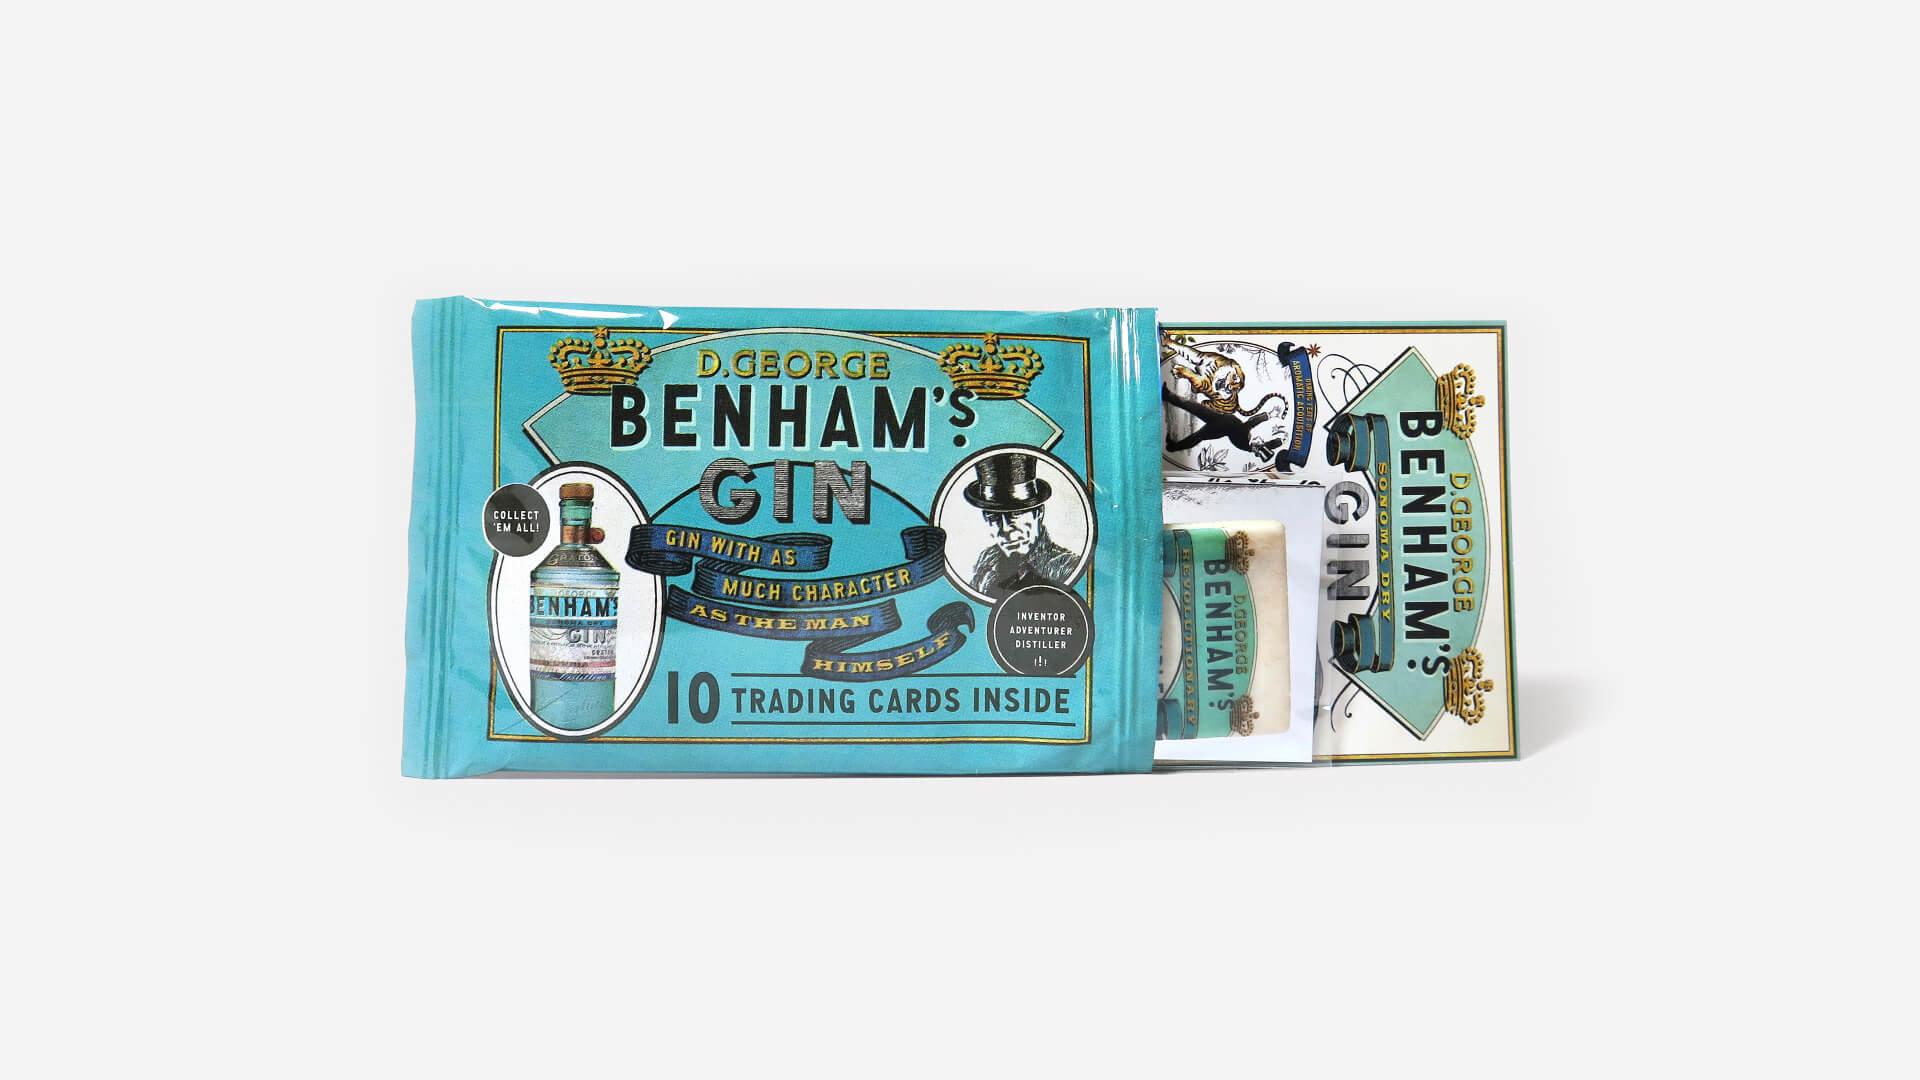 Benham's Trading Cards